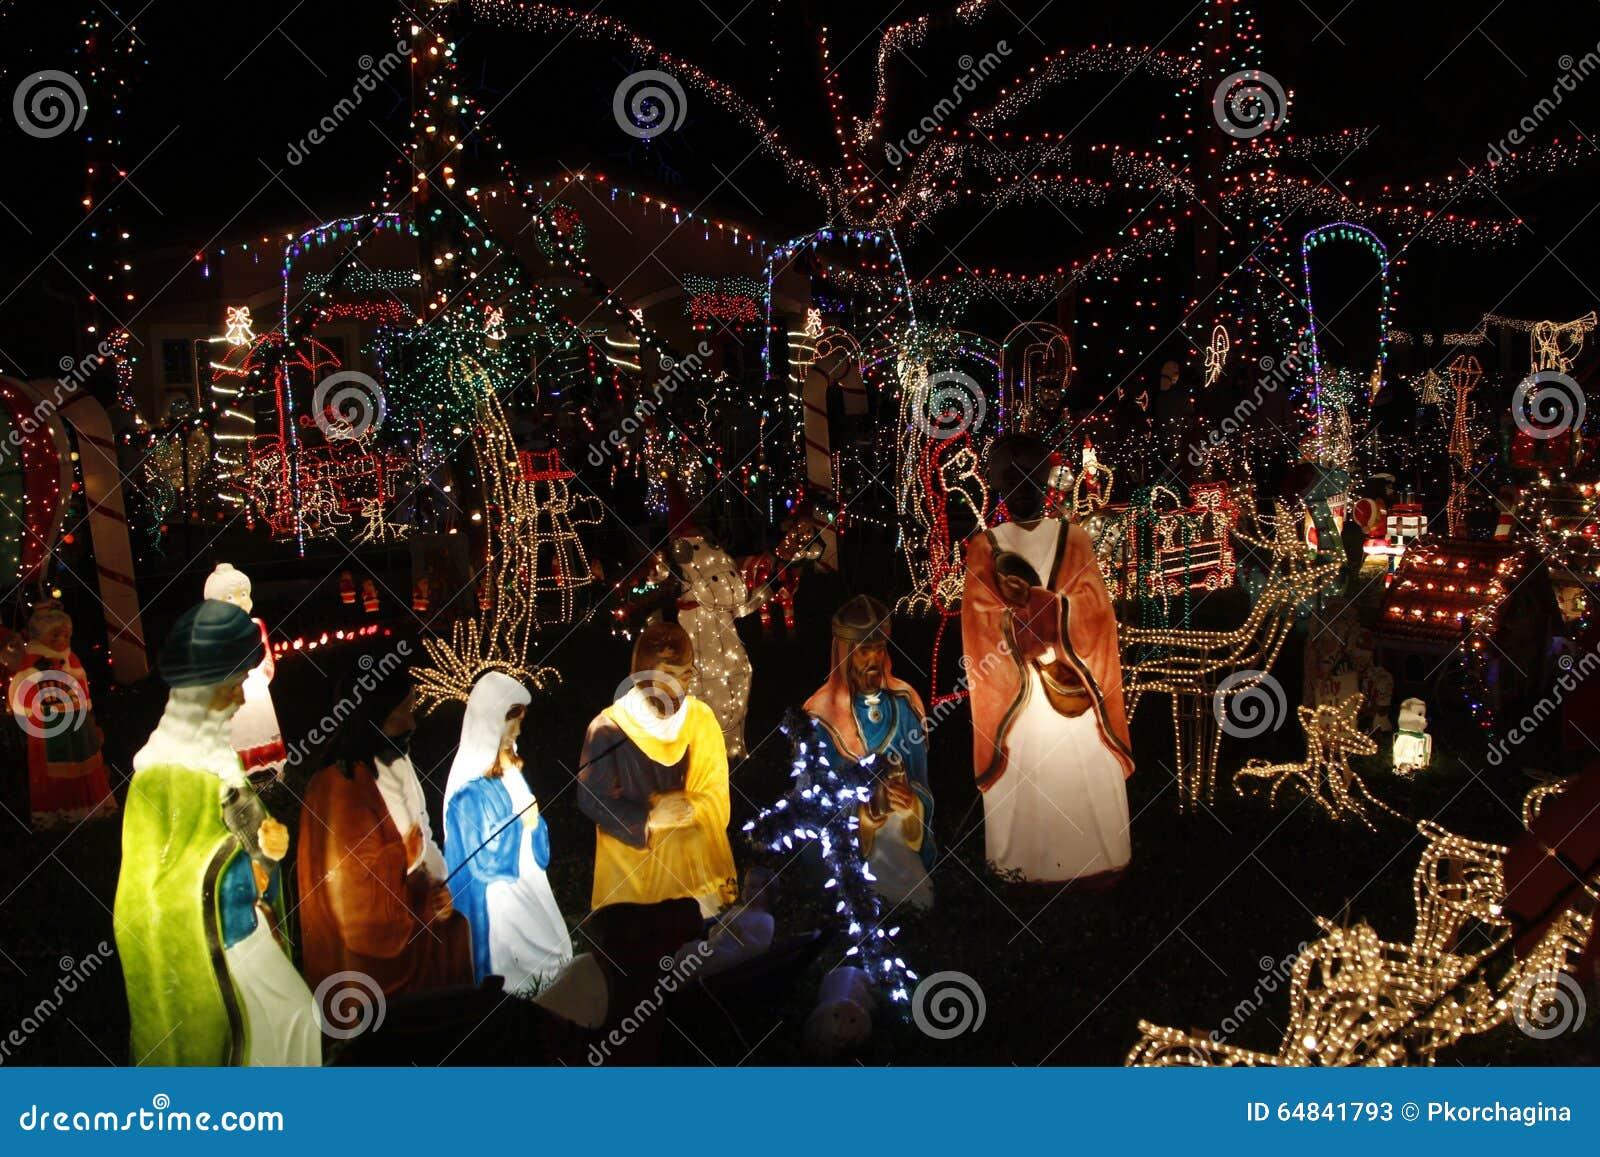 download miami christmas lights editorial stock photo image of celebration 64841793